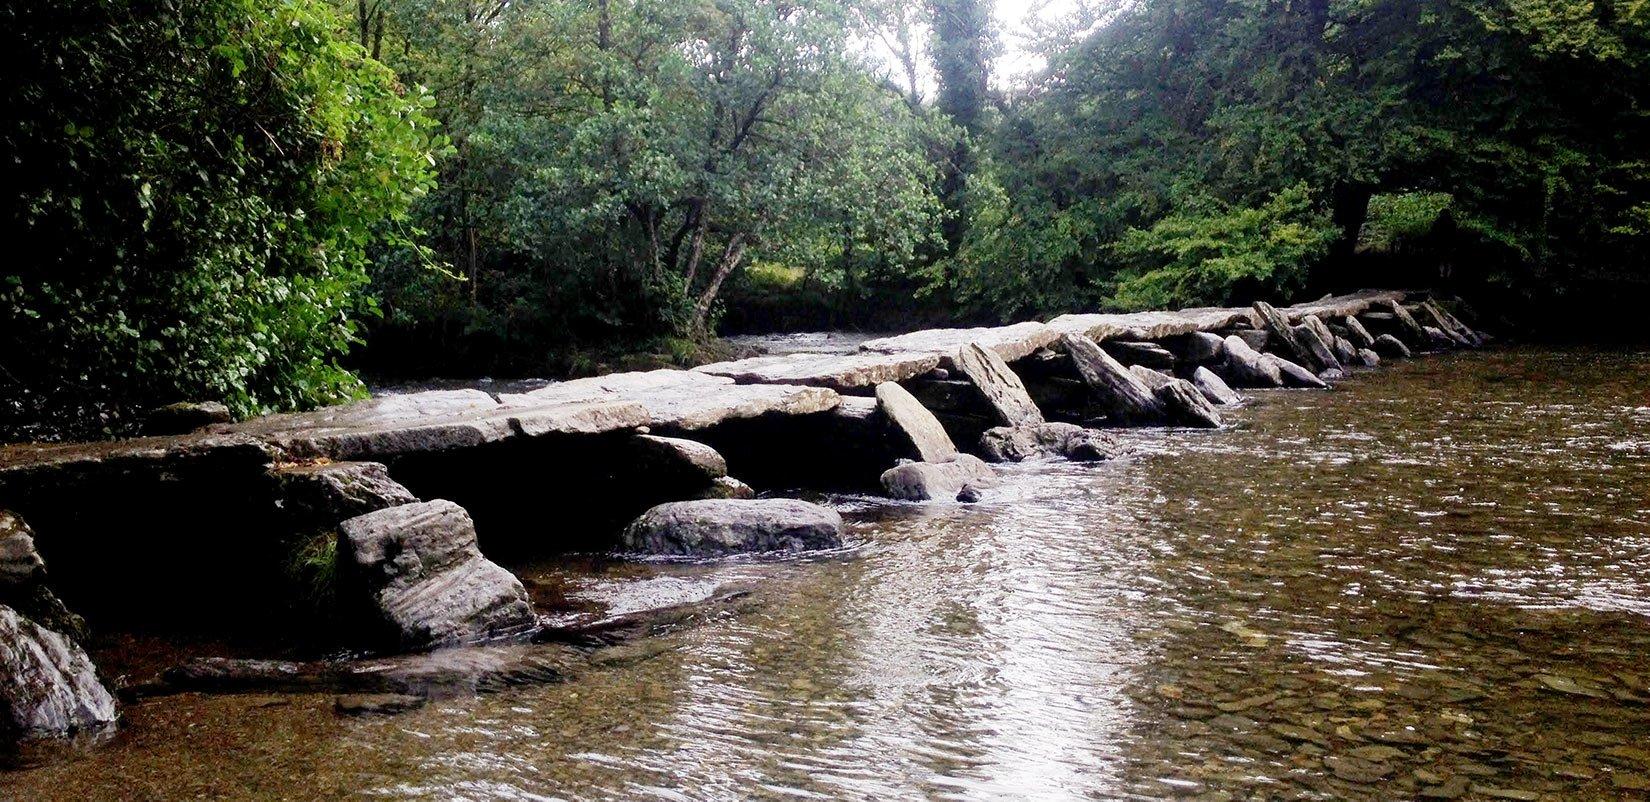 Tarr Steps, one of Exmoor Naitonal Park's beauty spots, ideal for photography